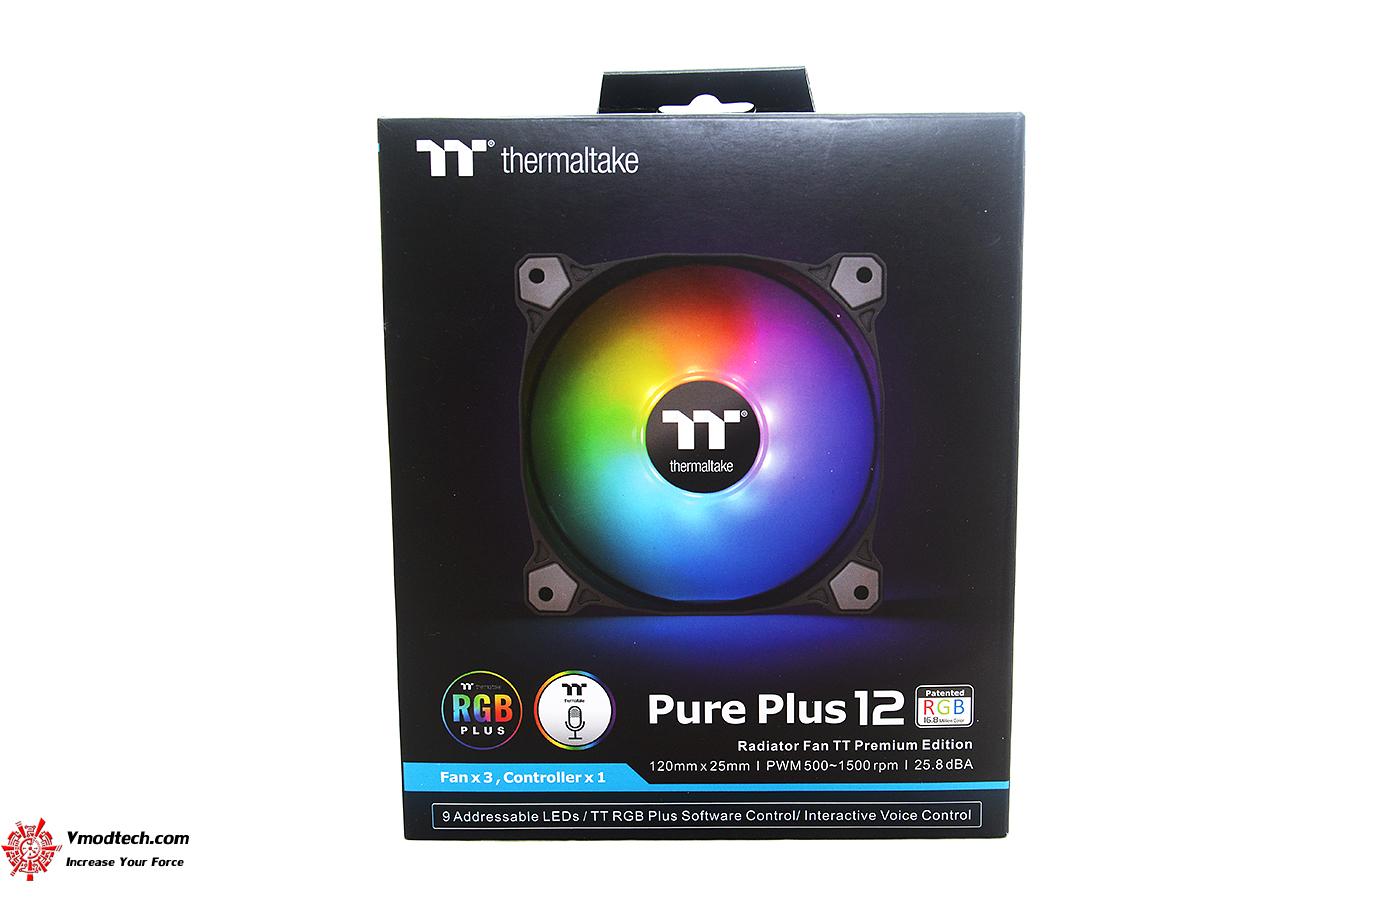 dsc 8796 Thermaltake Pure Plus 12 LED RGB Radiator Fan TT Premium Edition (3 Fan Pack) Review